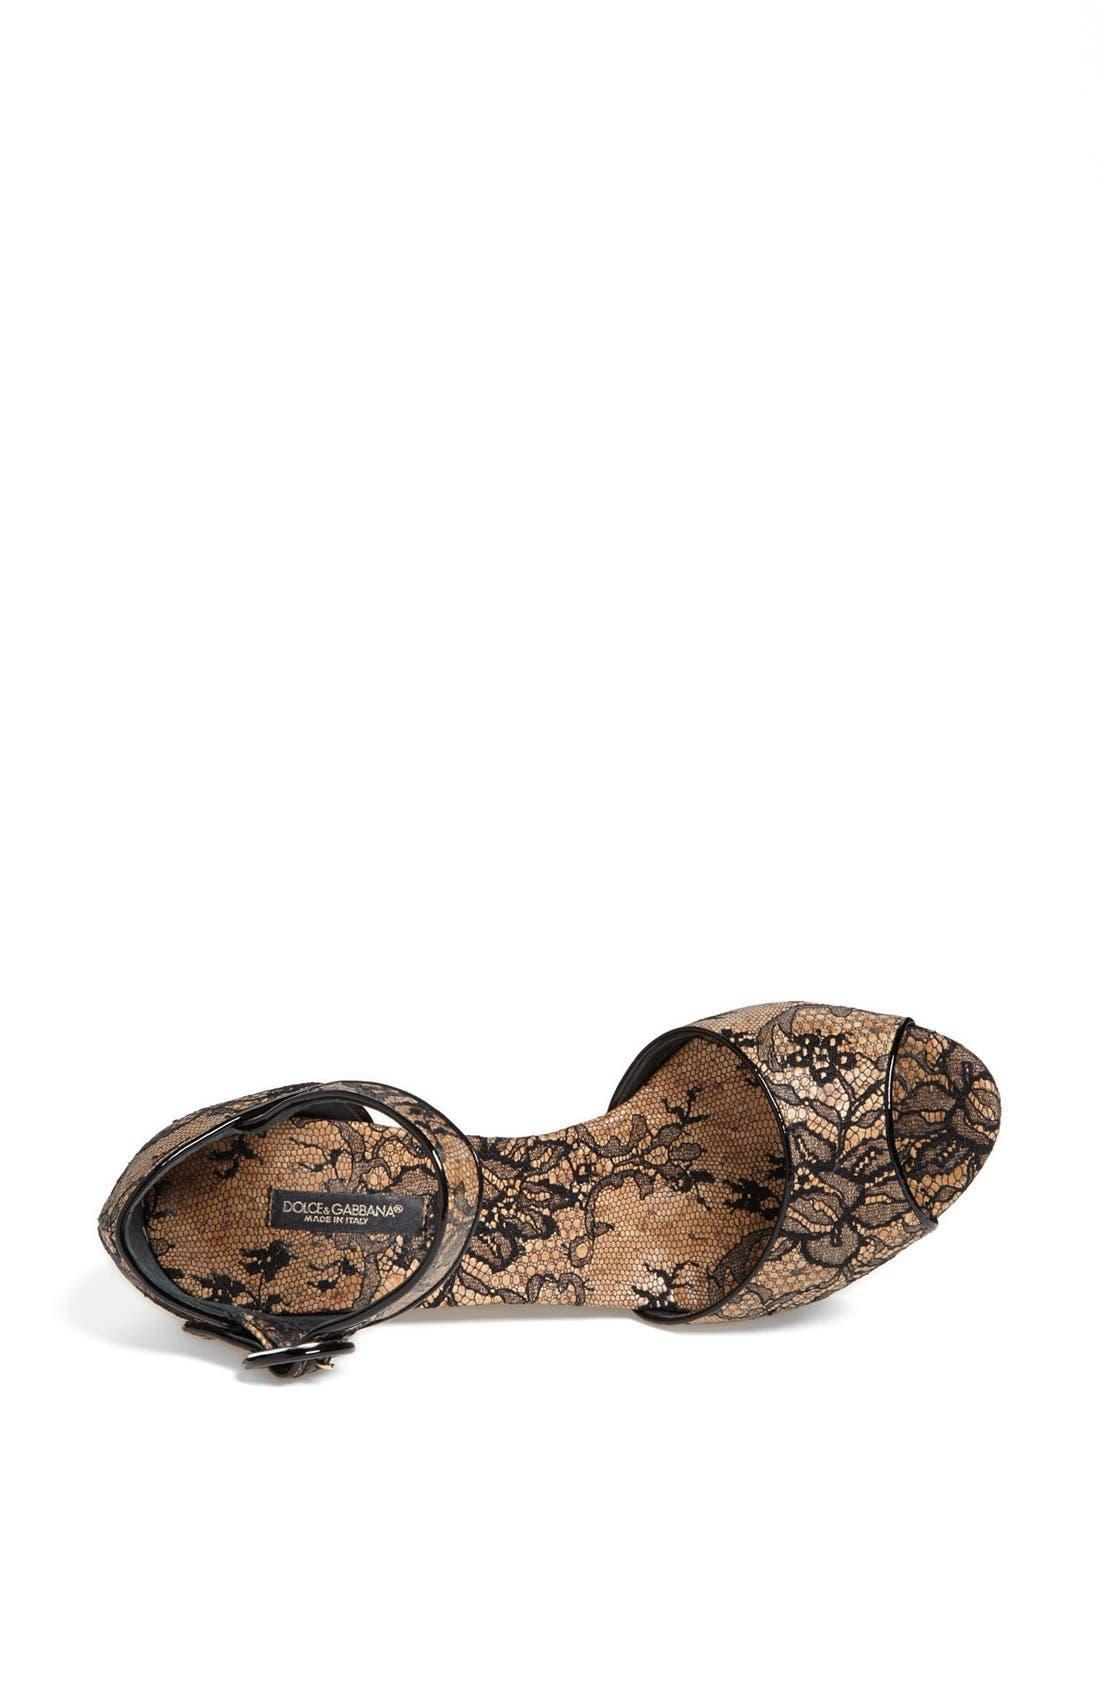 Alternate Image 3  - Dolce&Gabbana Lace Wedge Sandal